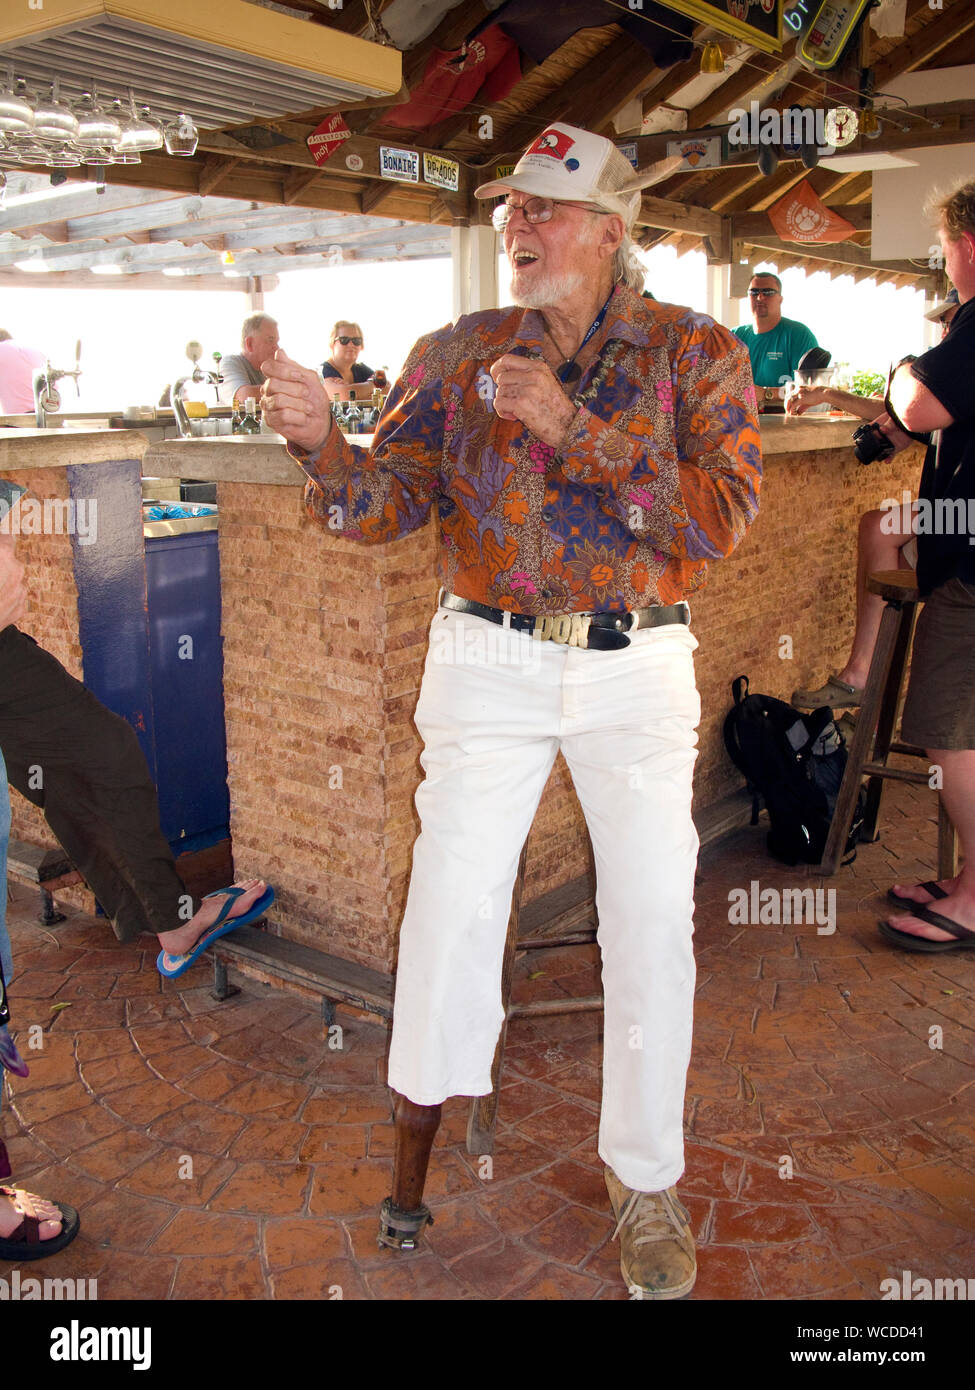 Captain Don, pionier and owner of Captain Don's Habitat, famous Dive hotel and resort, Kralendijk, Bonaire, Netherland Antilles Stock Photo